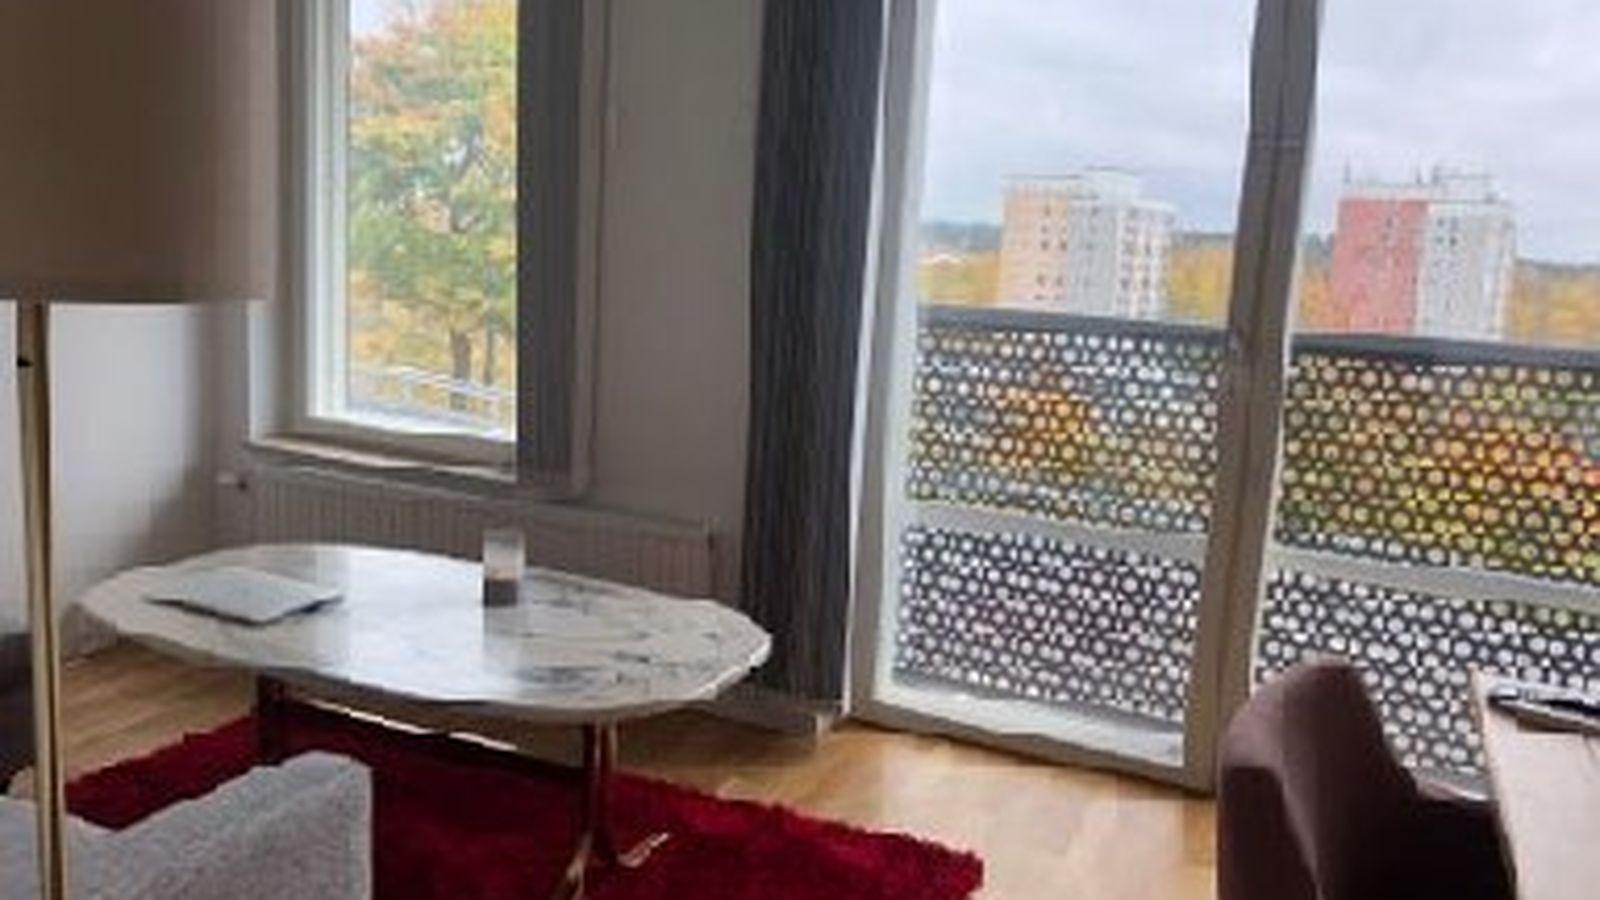 Ledig lägenhet i Botkyrka